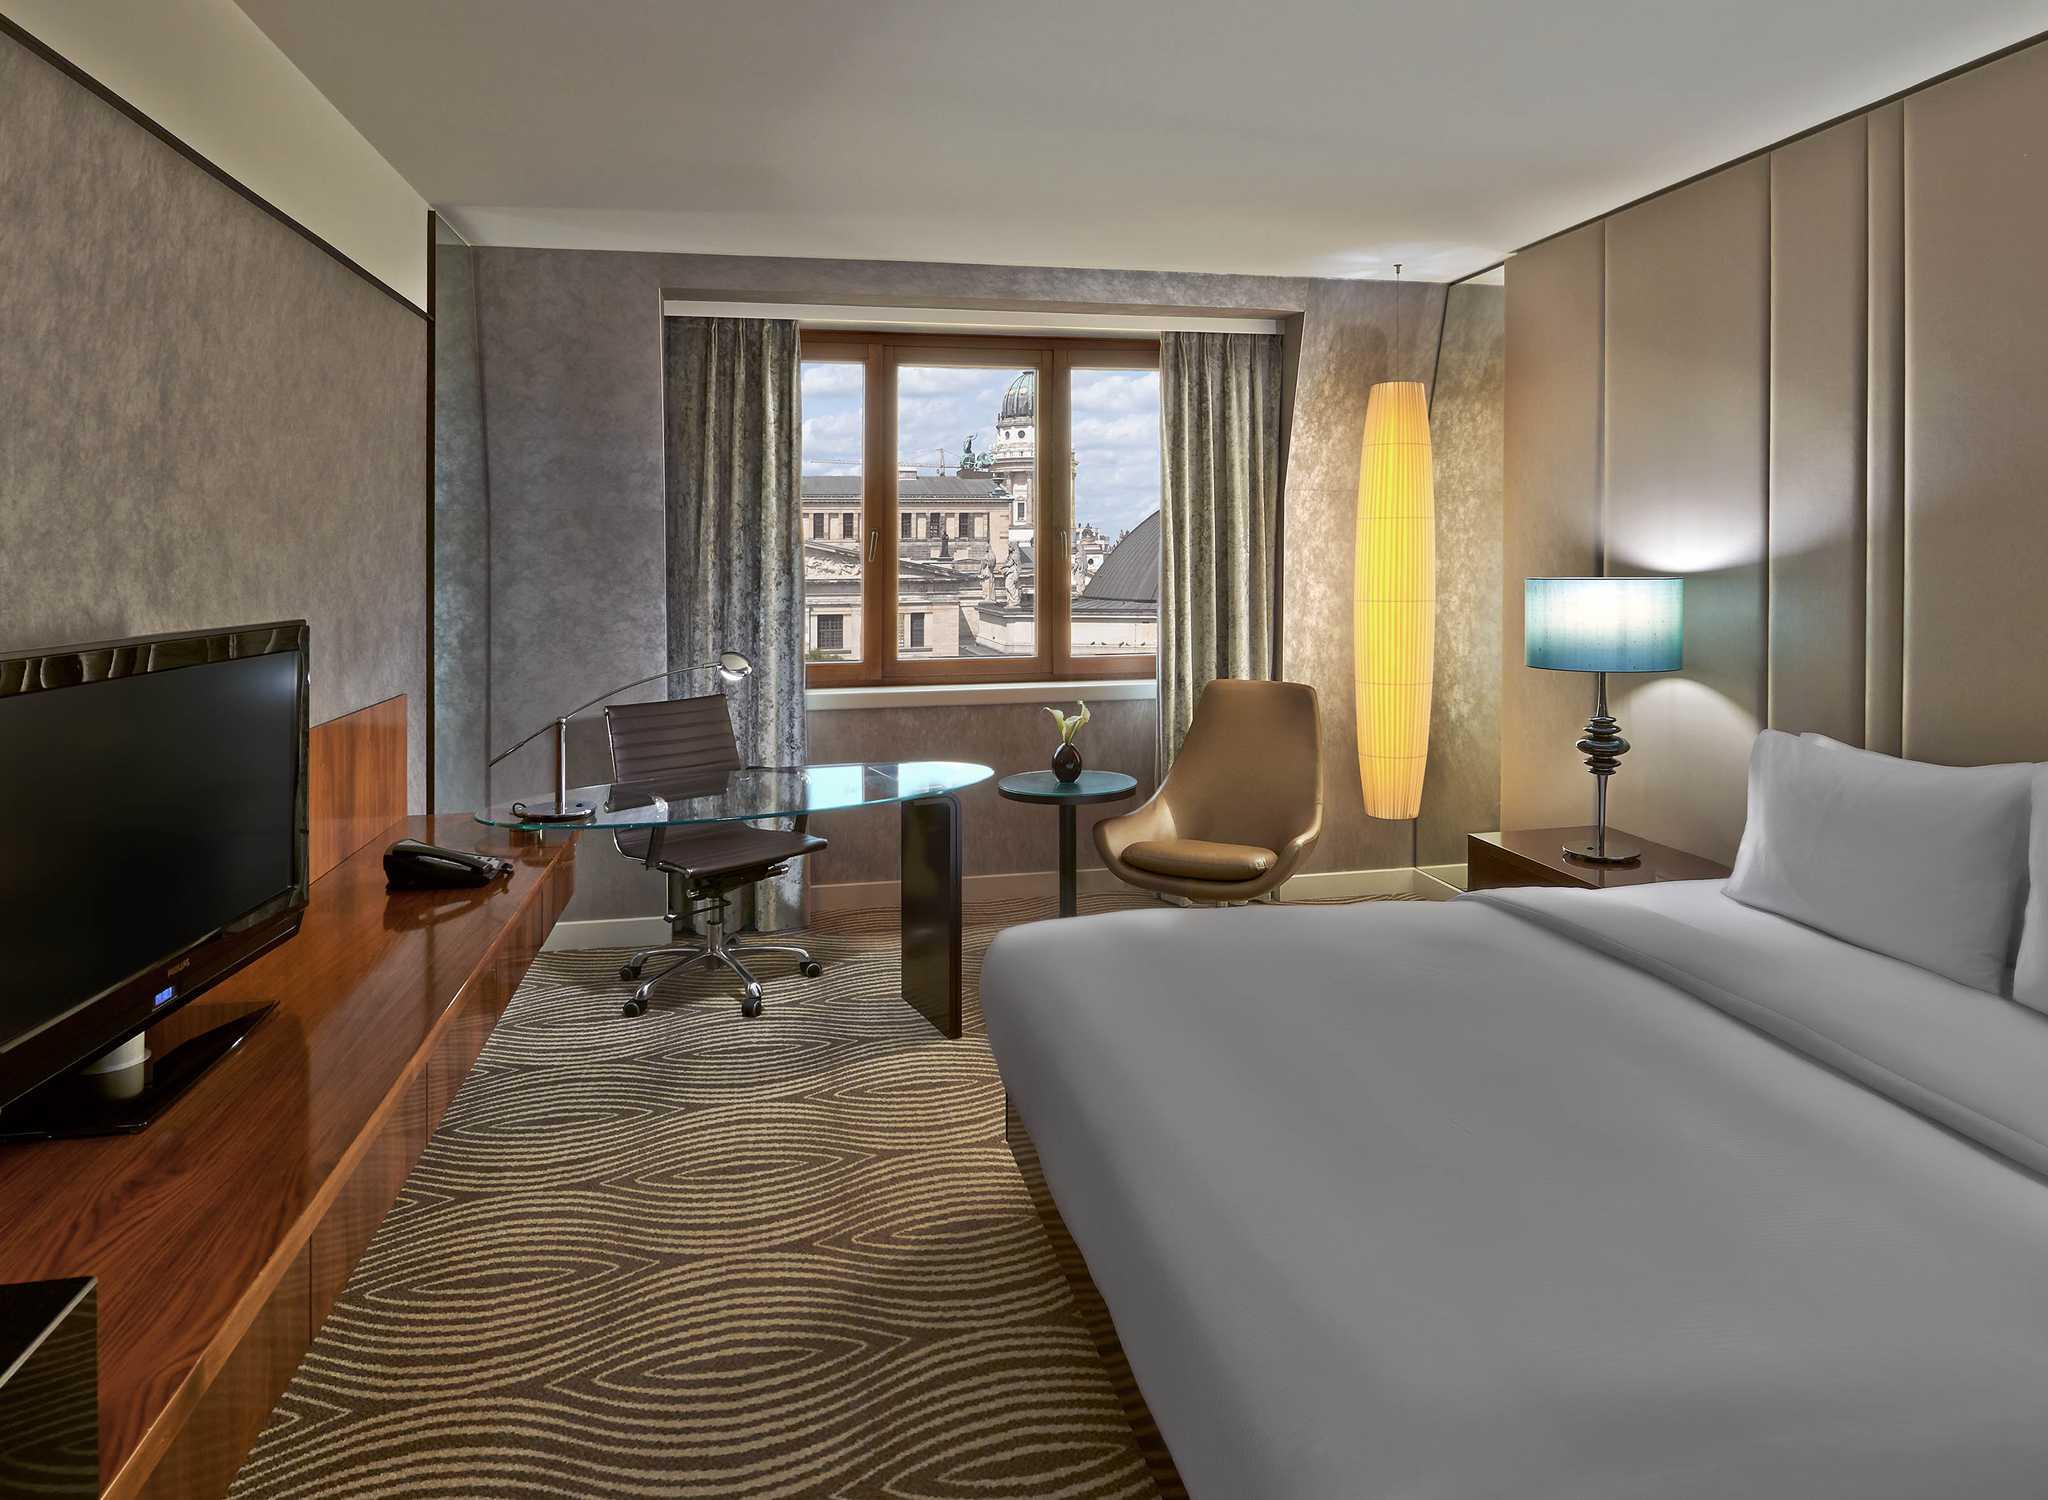 hilton berlin hotel hotel in berlin deutschland berlin mitte hotel. Black Bedroom Furniture Sets. Home Design Ideas